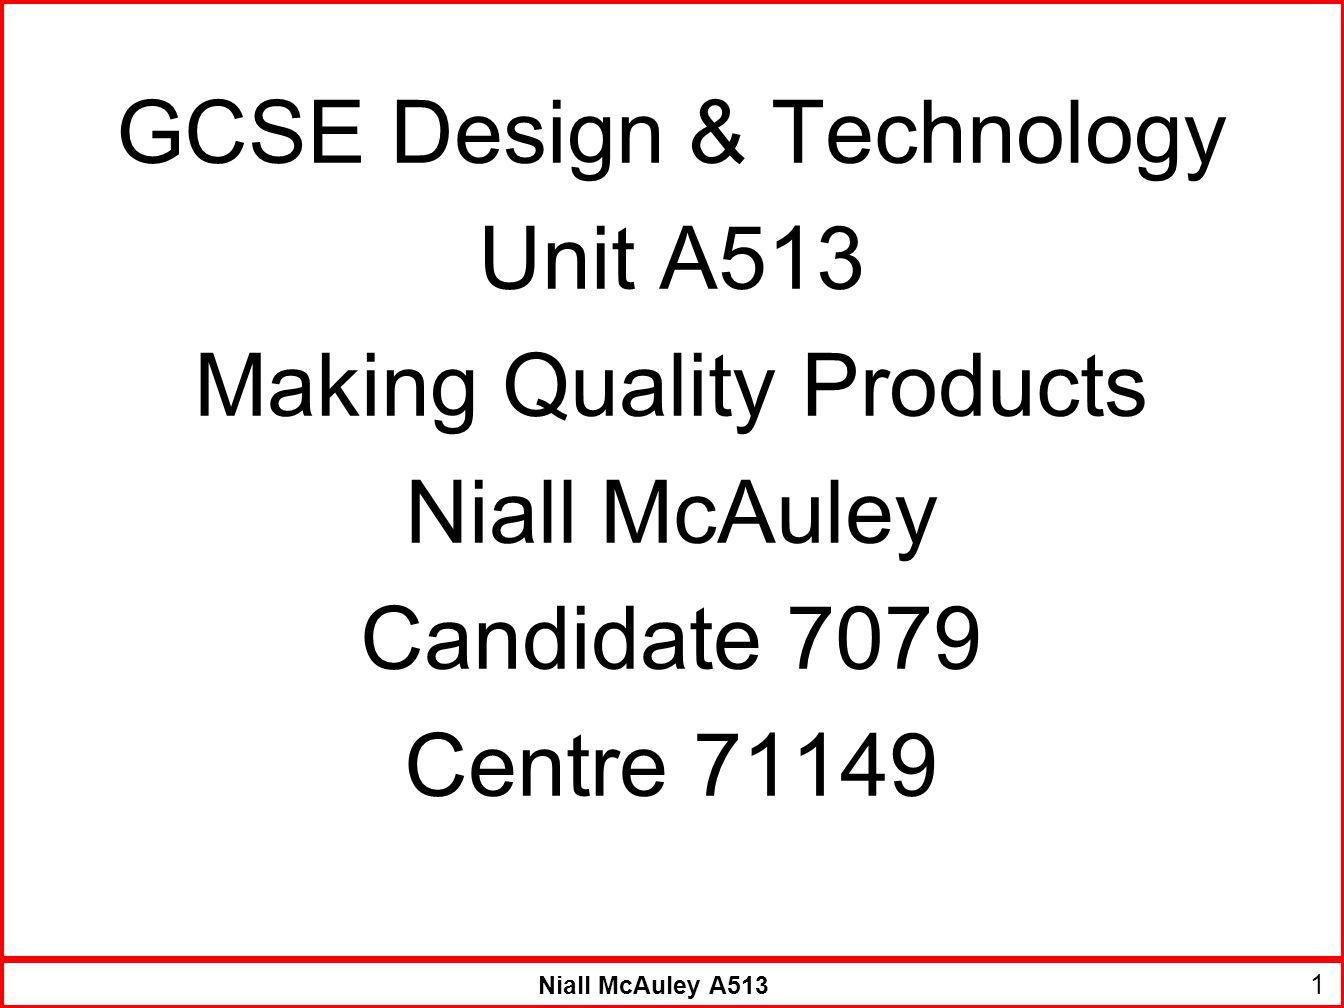 Niall McAuley A513 GCSE Design & Technology Unit A513 Making Quality Products Niall McAuley Candidate 7079 Centre 71149 1